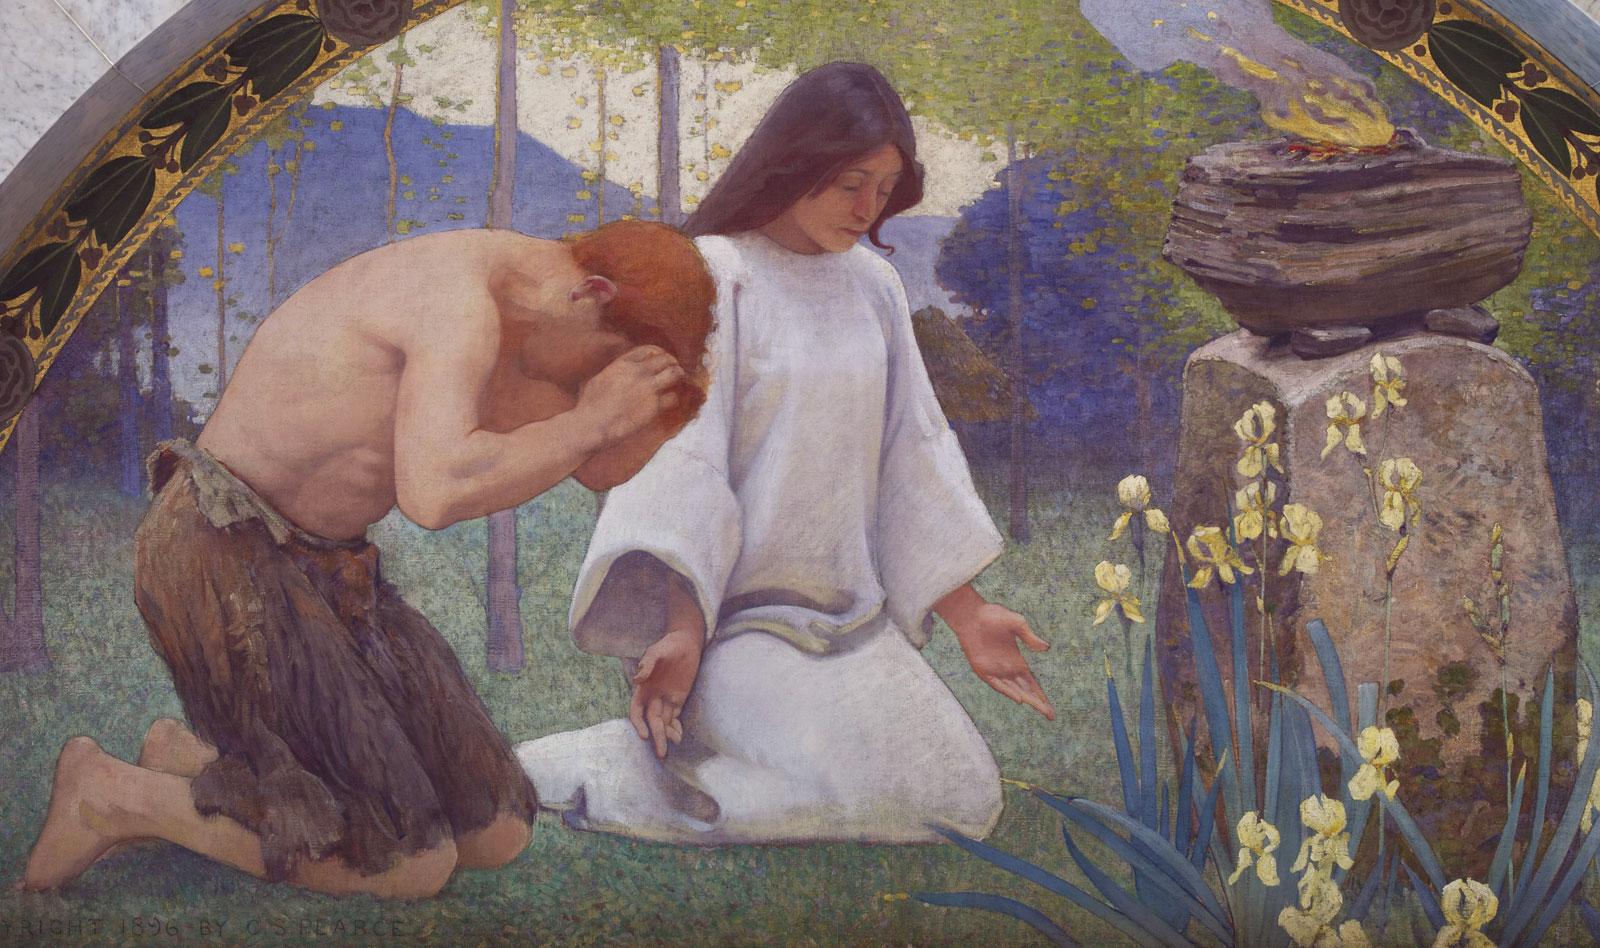 Man and woman worshipping nature.